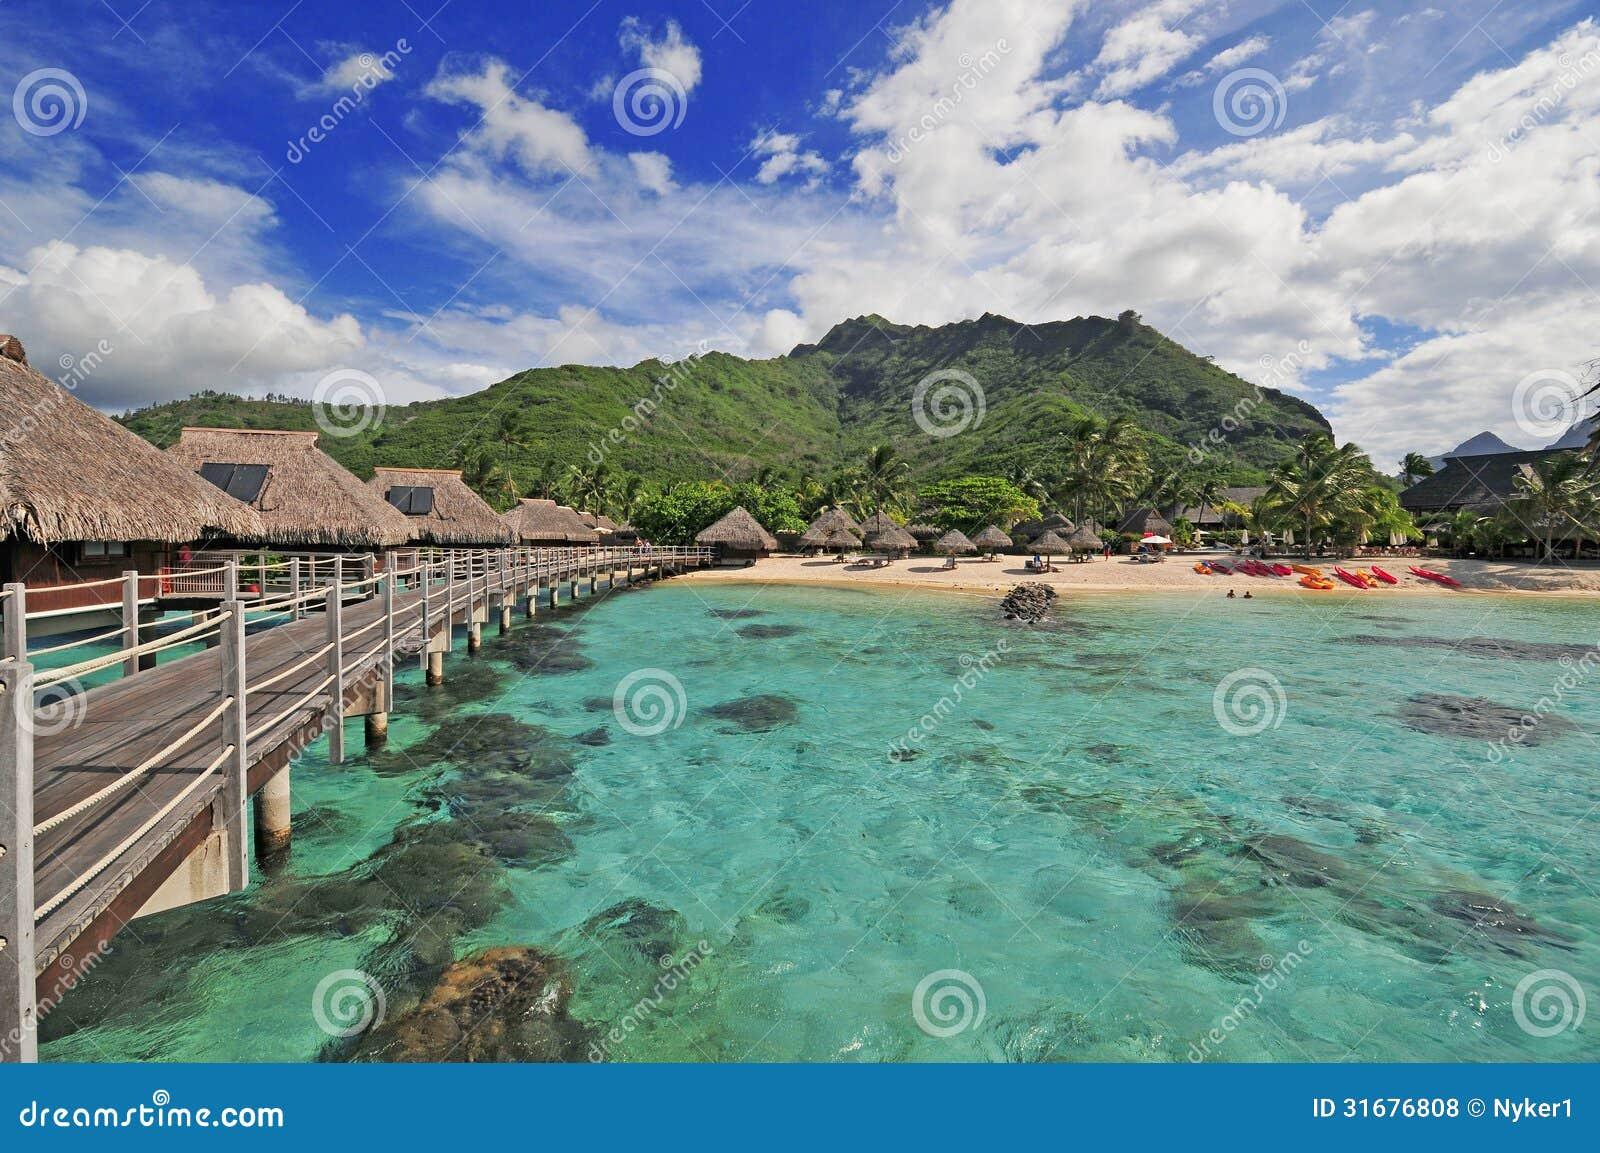 Moorea Island Lagoon In Tahiti French Polynesia Stock Photo